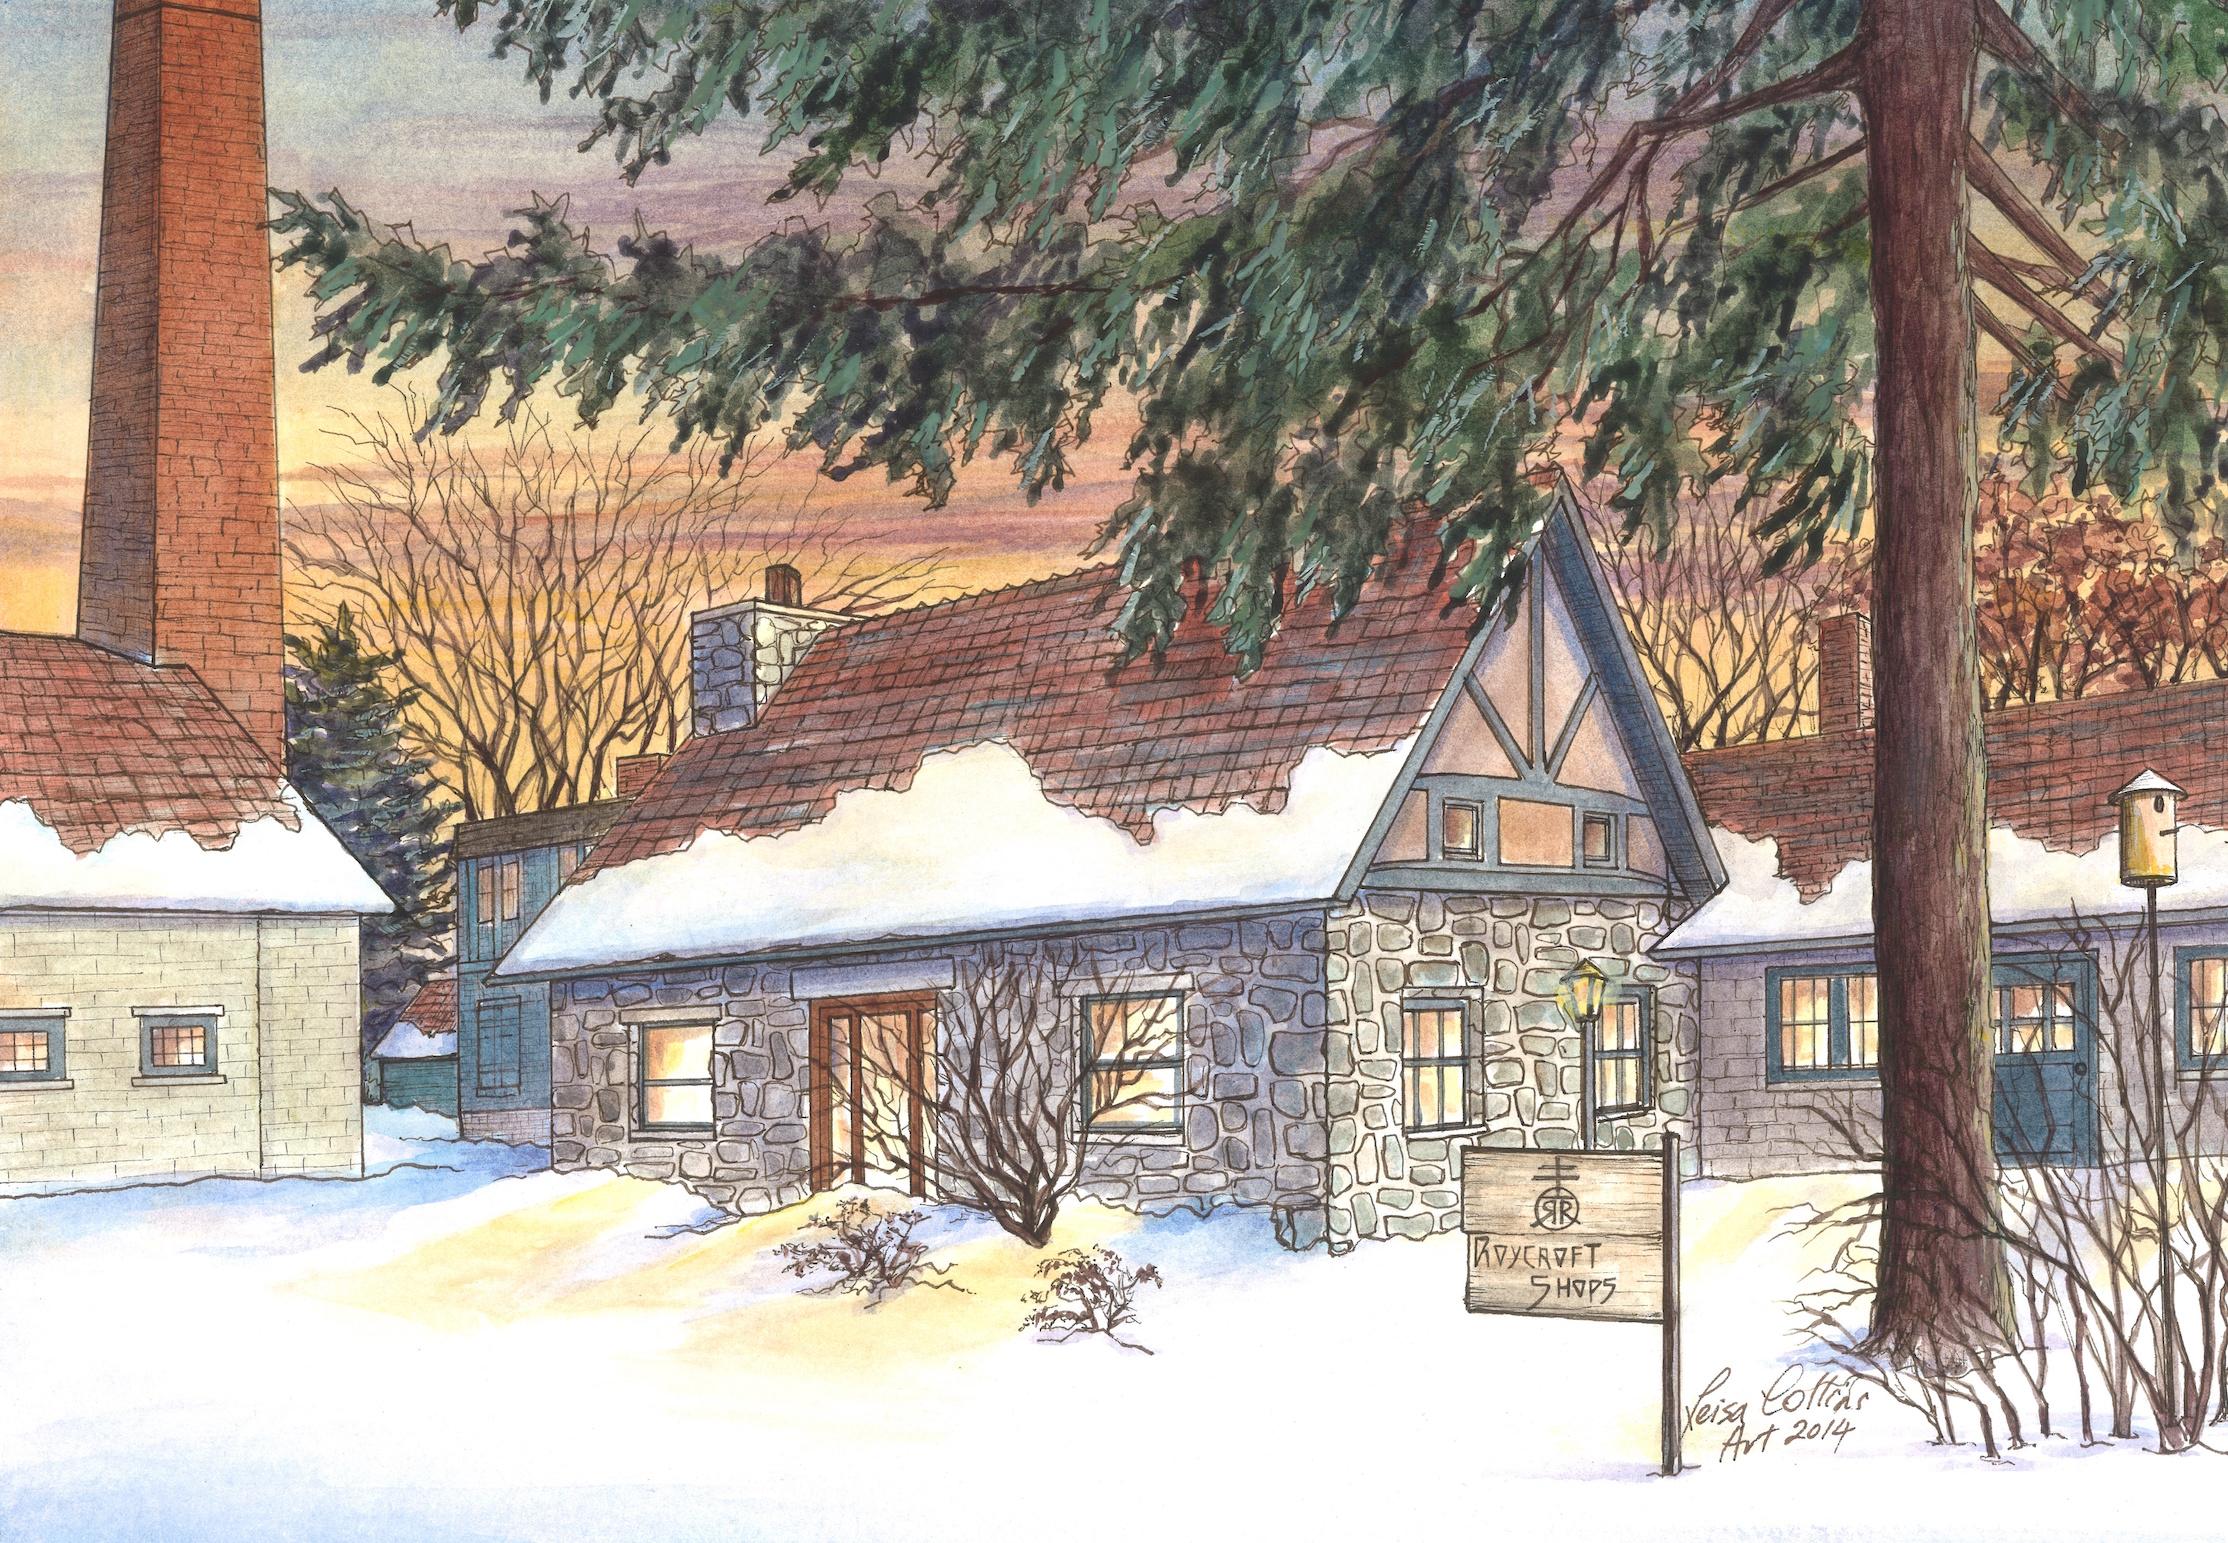 18.-Arts-Crafts-Historic-Places-Roycroft-Campus-